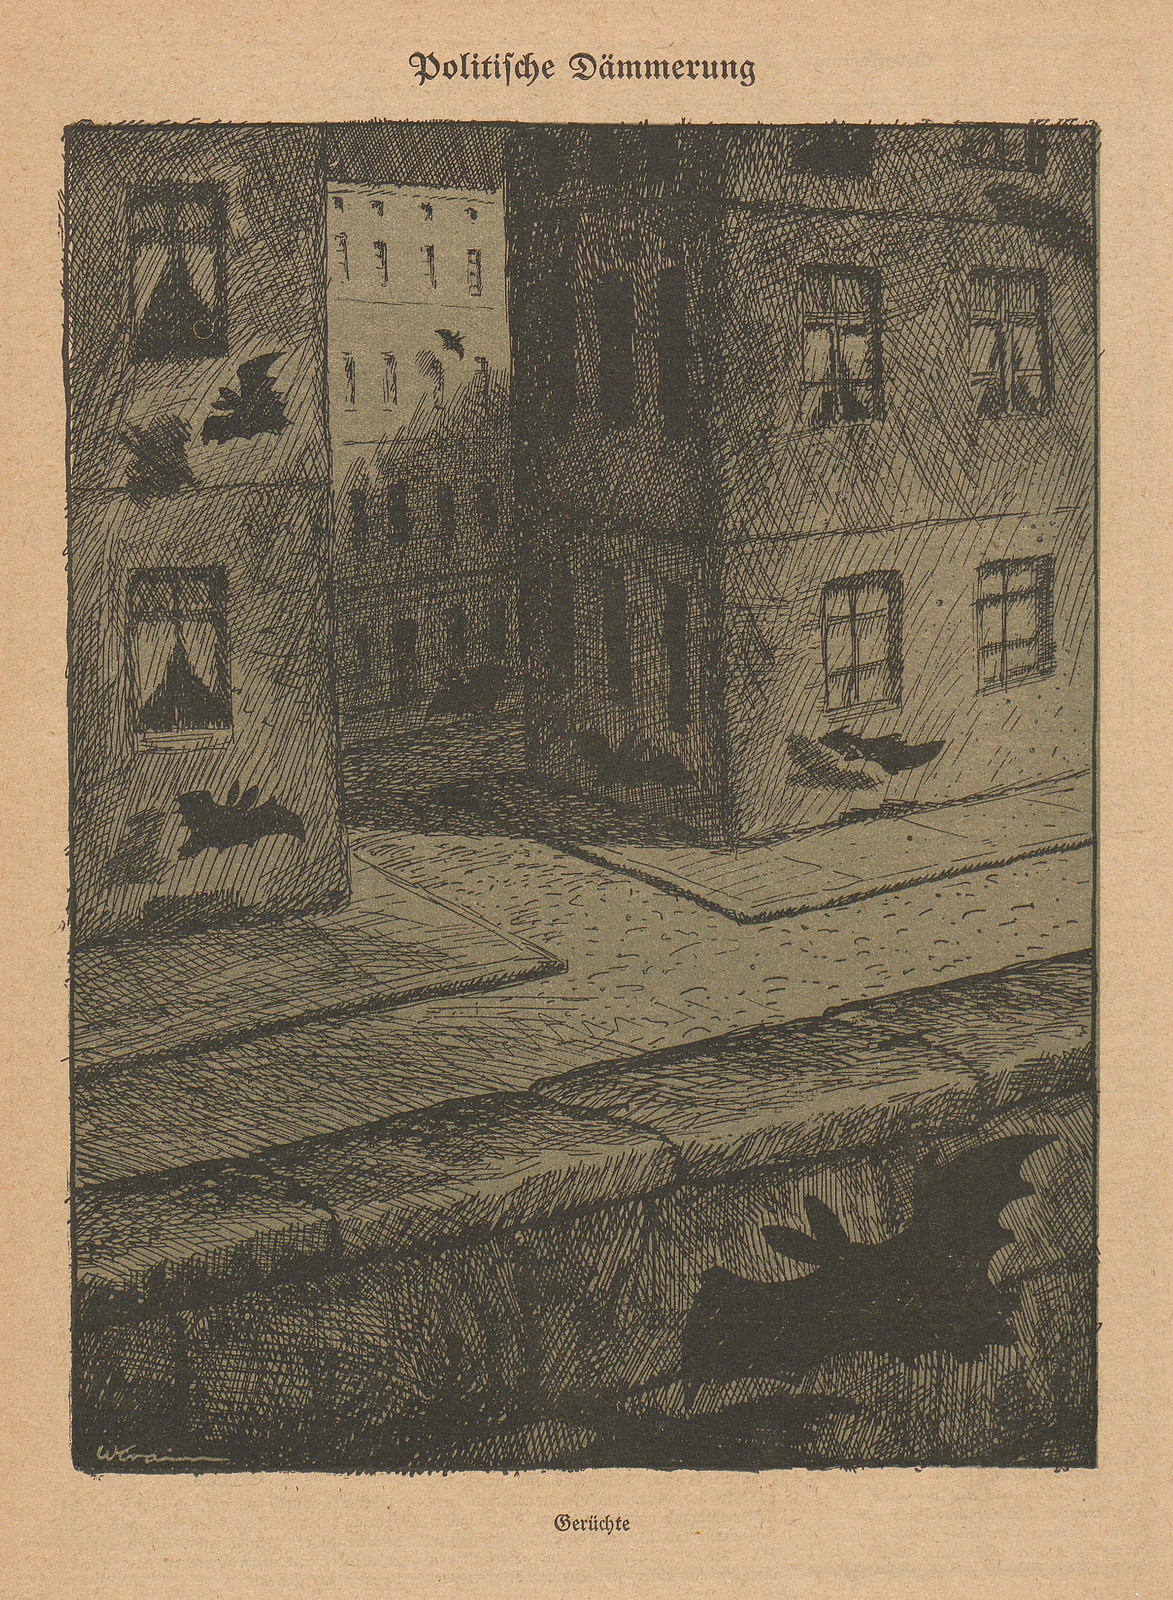 Willibald Krain - Political Twilight, 1923